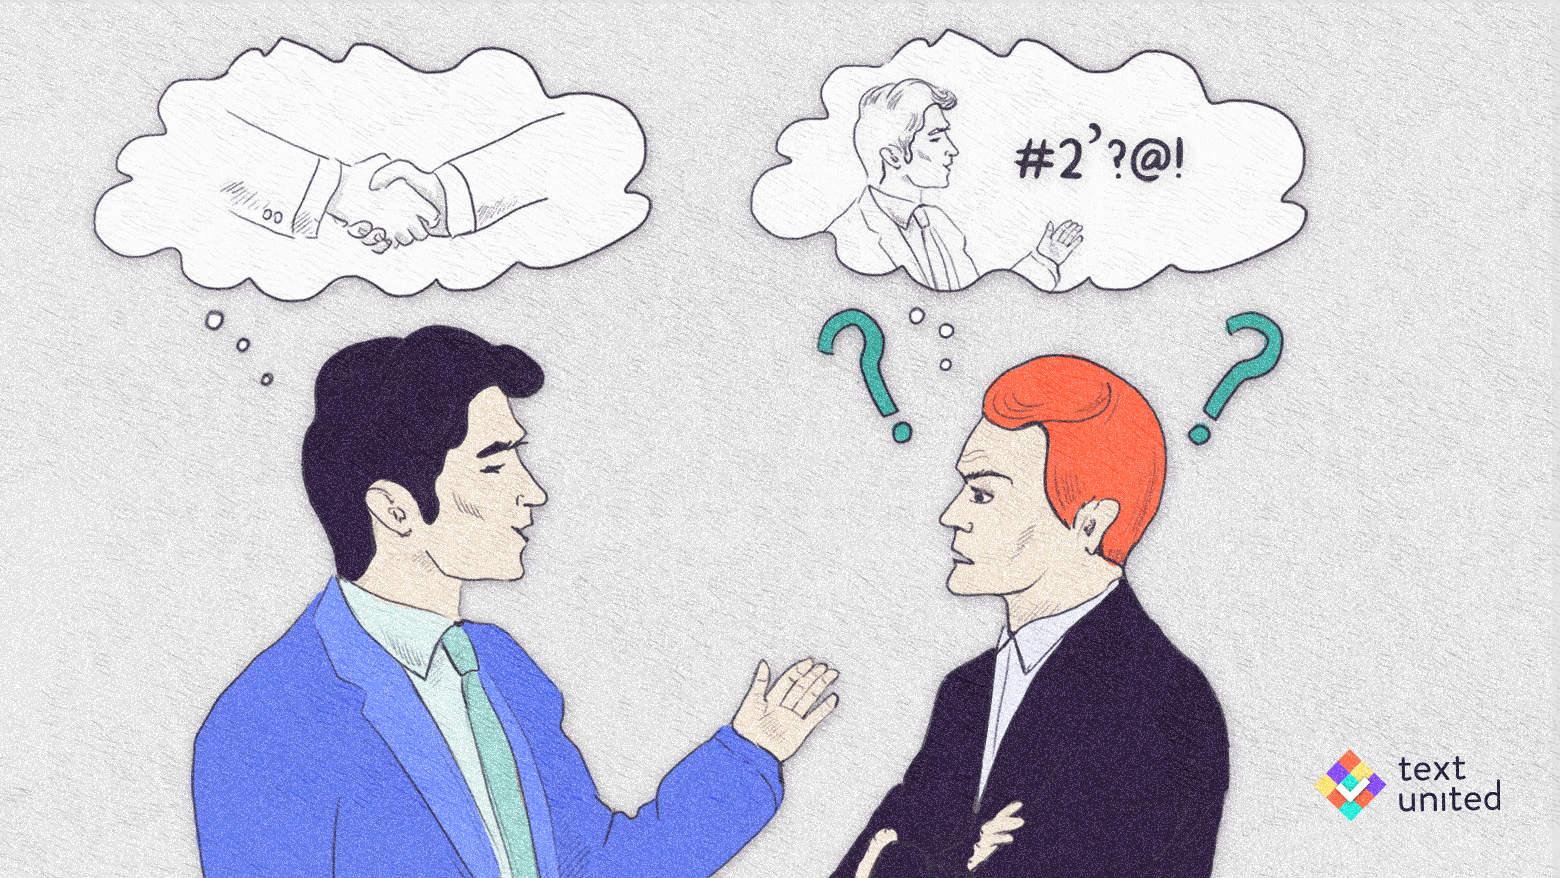 translators.dialogue